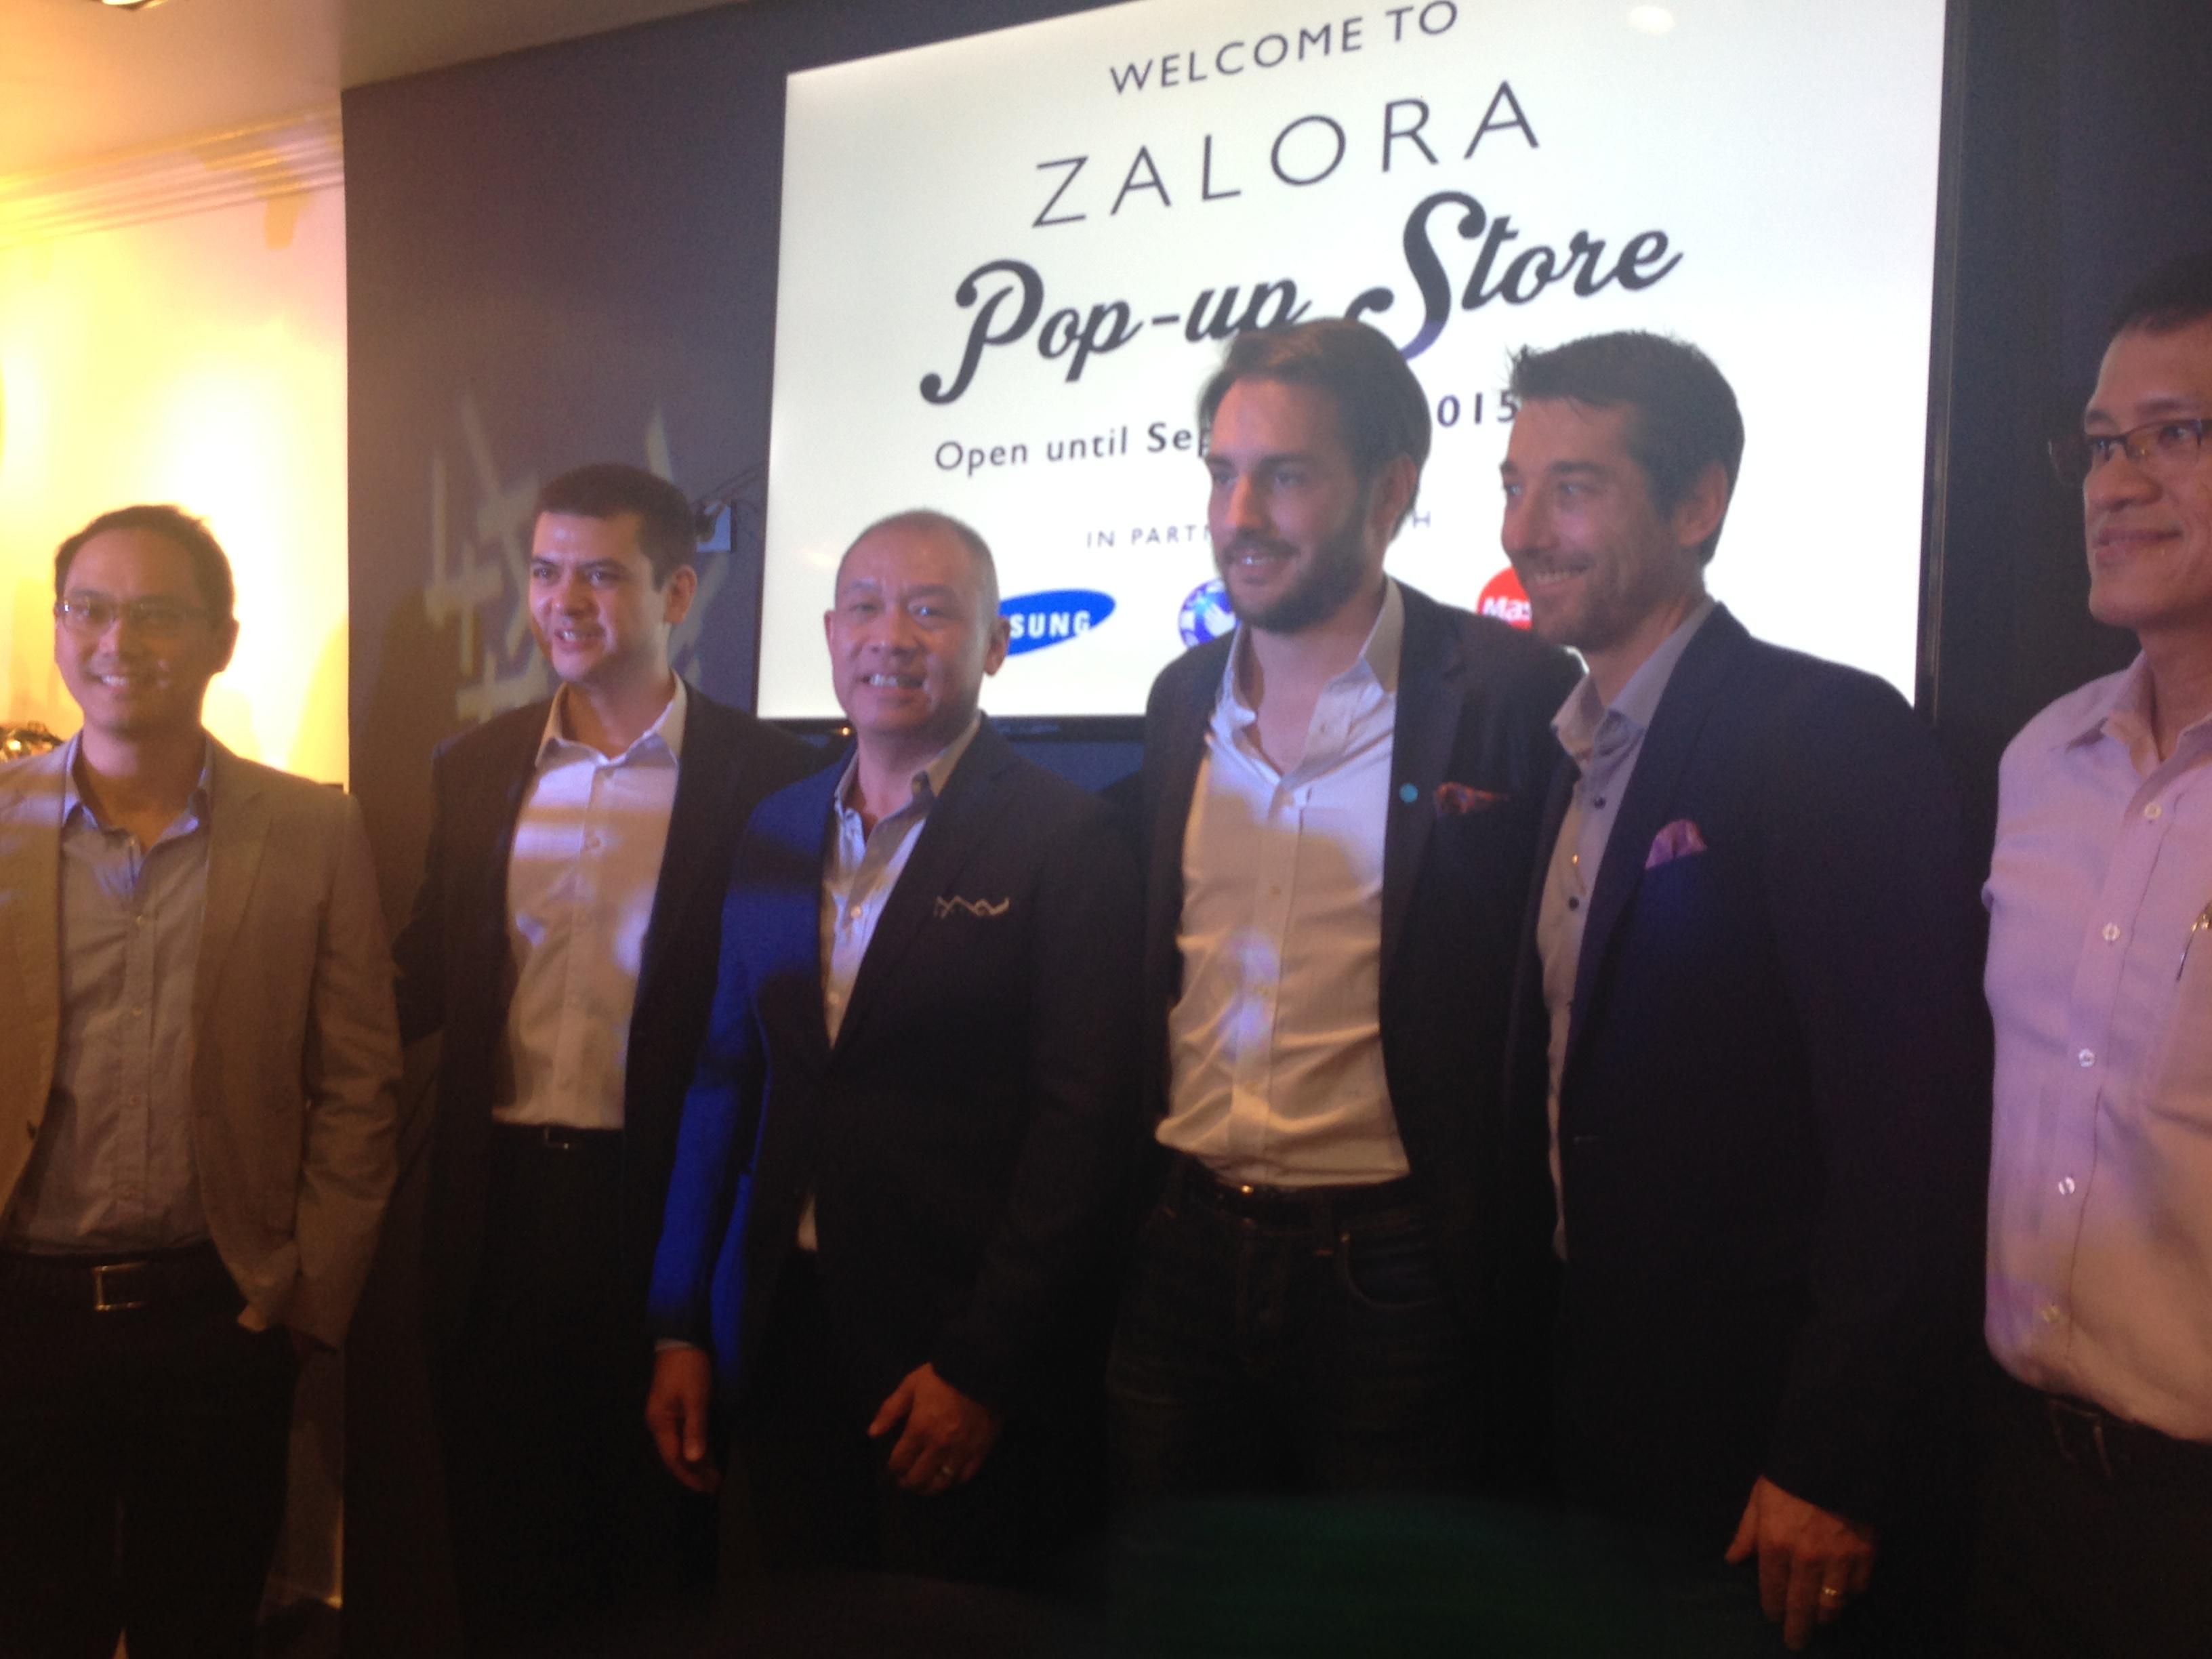 3e60dc5c5c6e Online Retailer Zalora Philippines Goes Offline With Pop Up Store